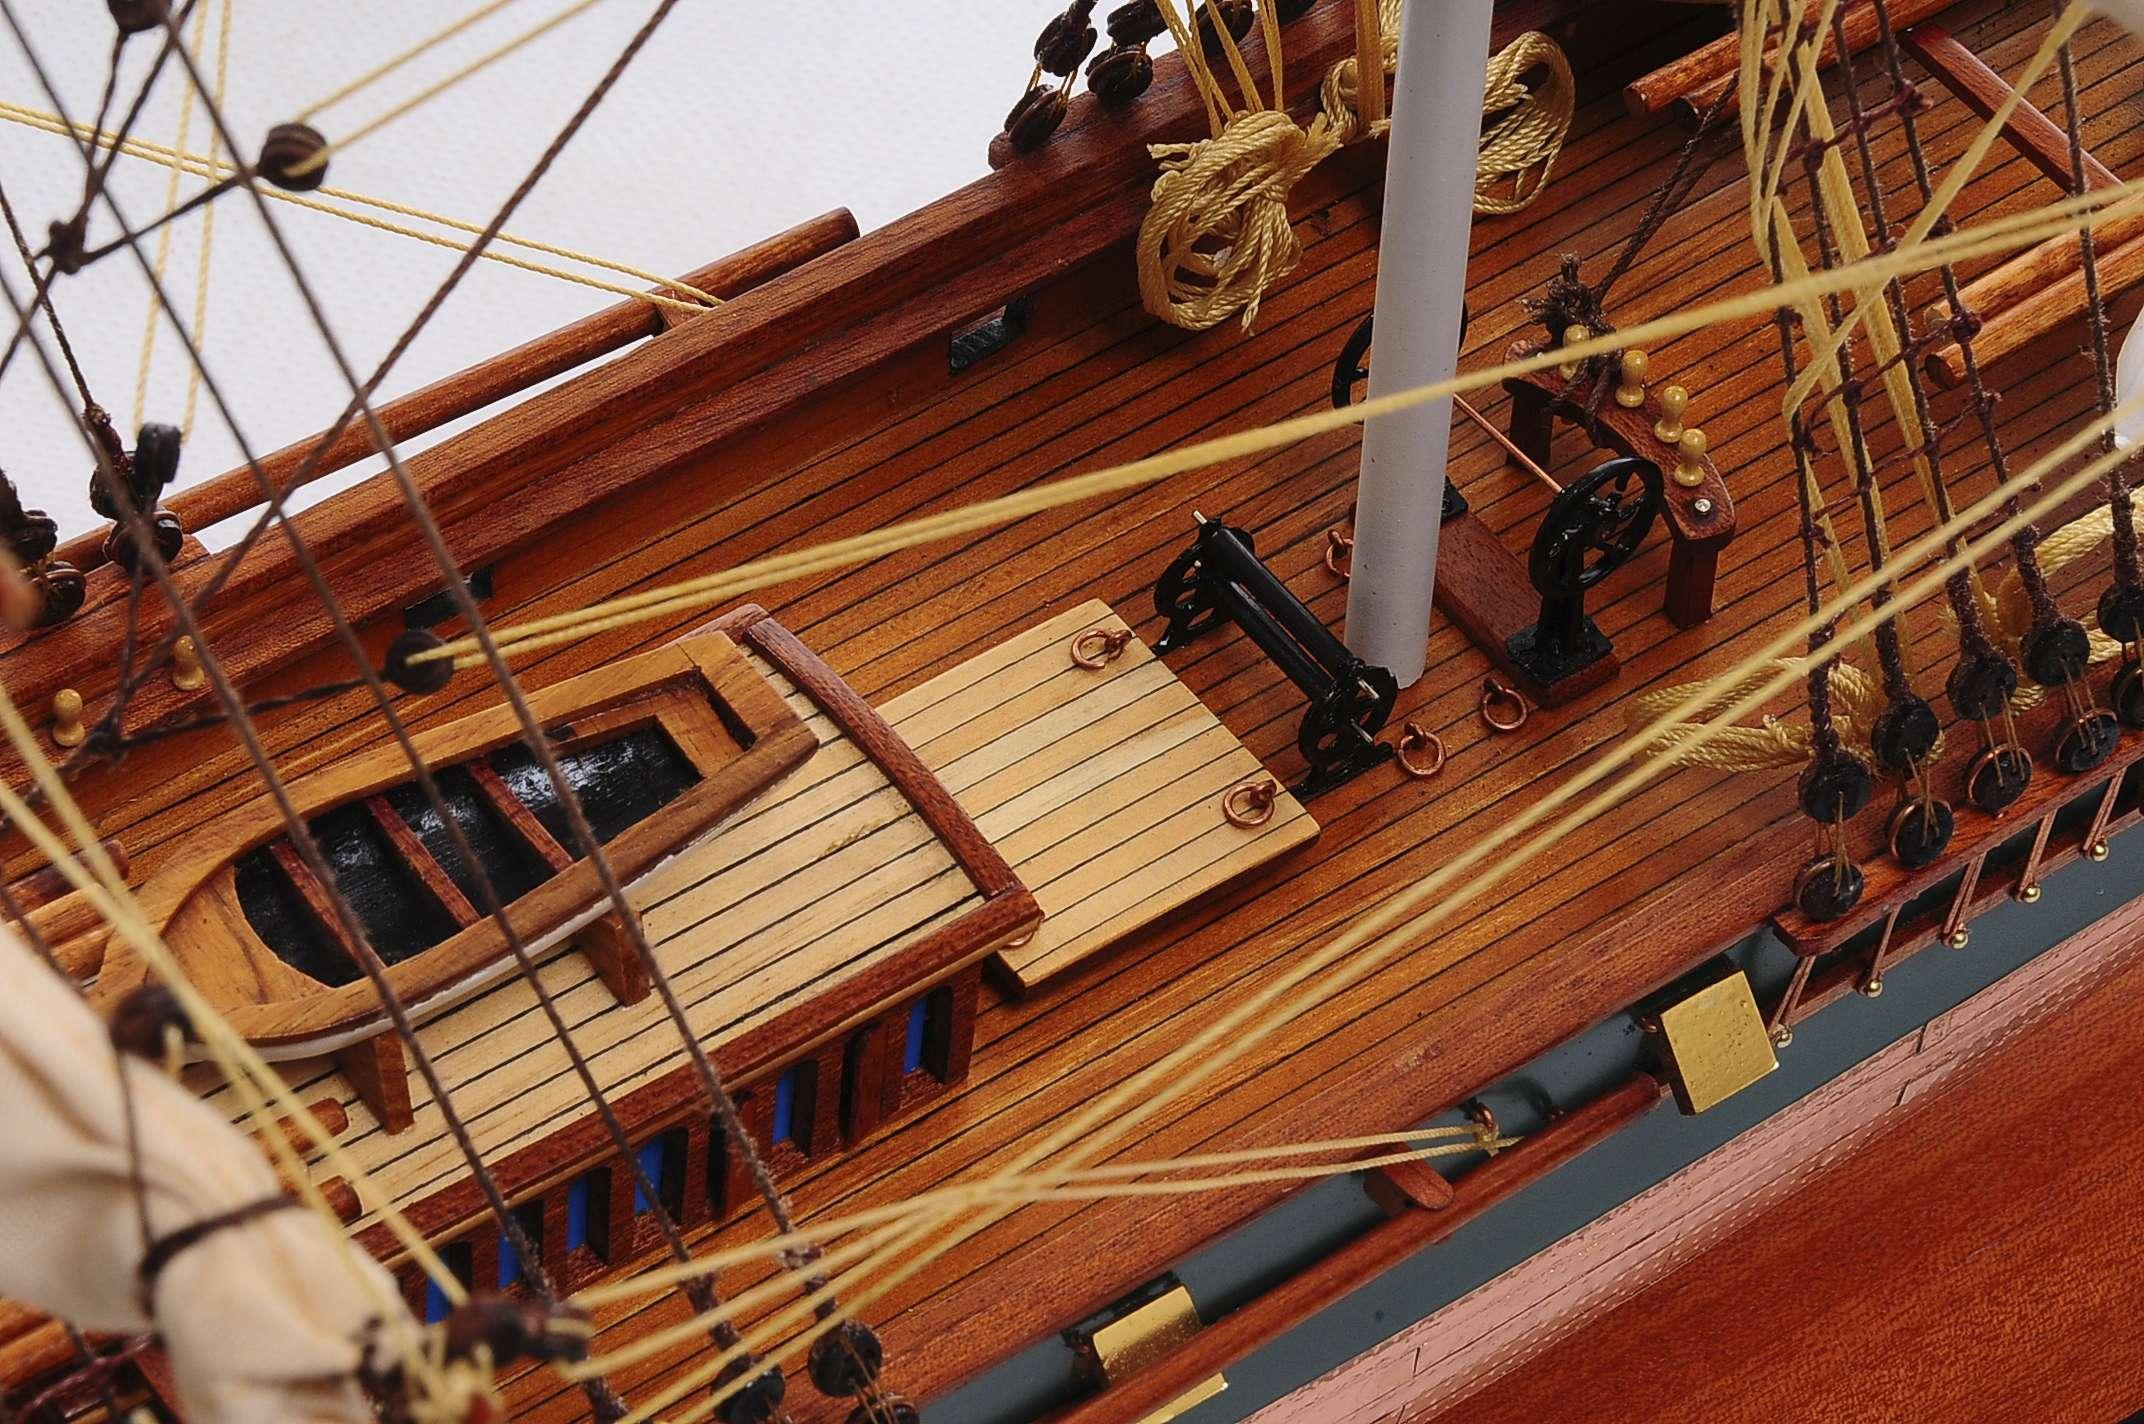 1434-4880-Thermopylae-Model-Boat